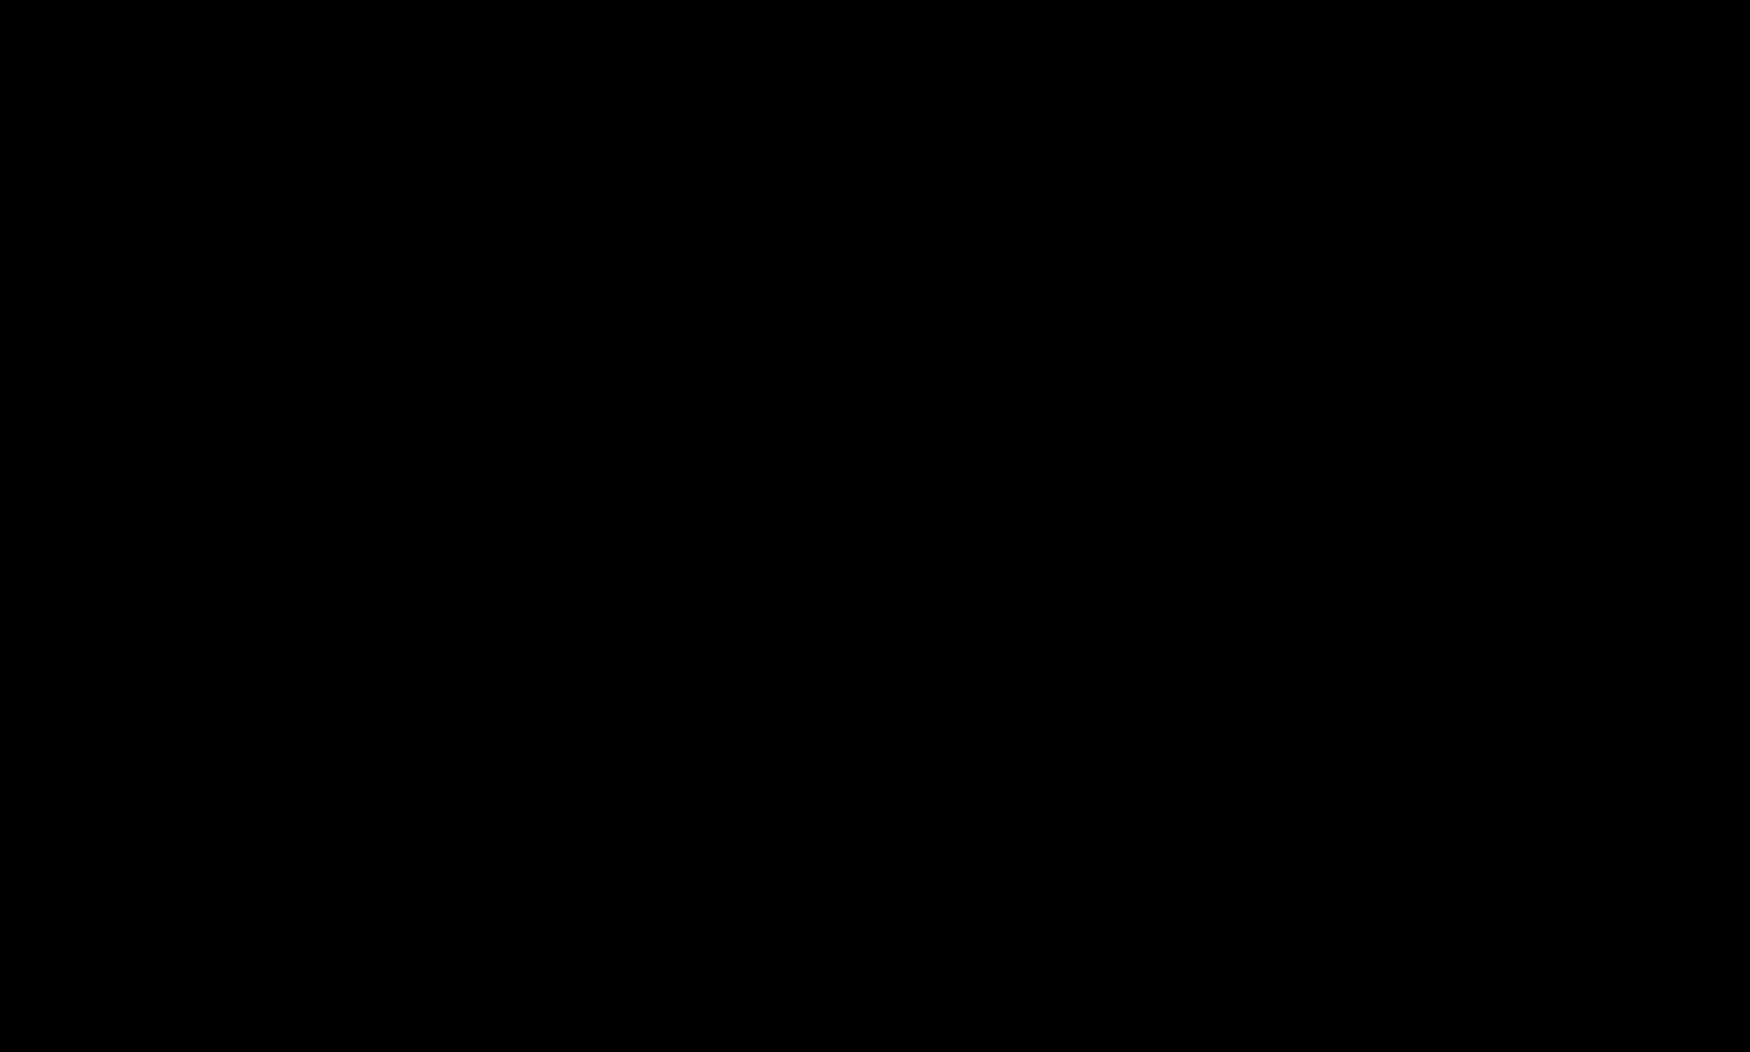 lijster Video CAM SHOW @ Cam4 04-03-2021